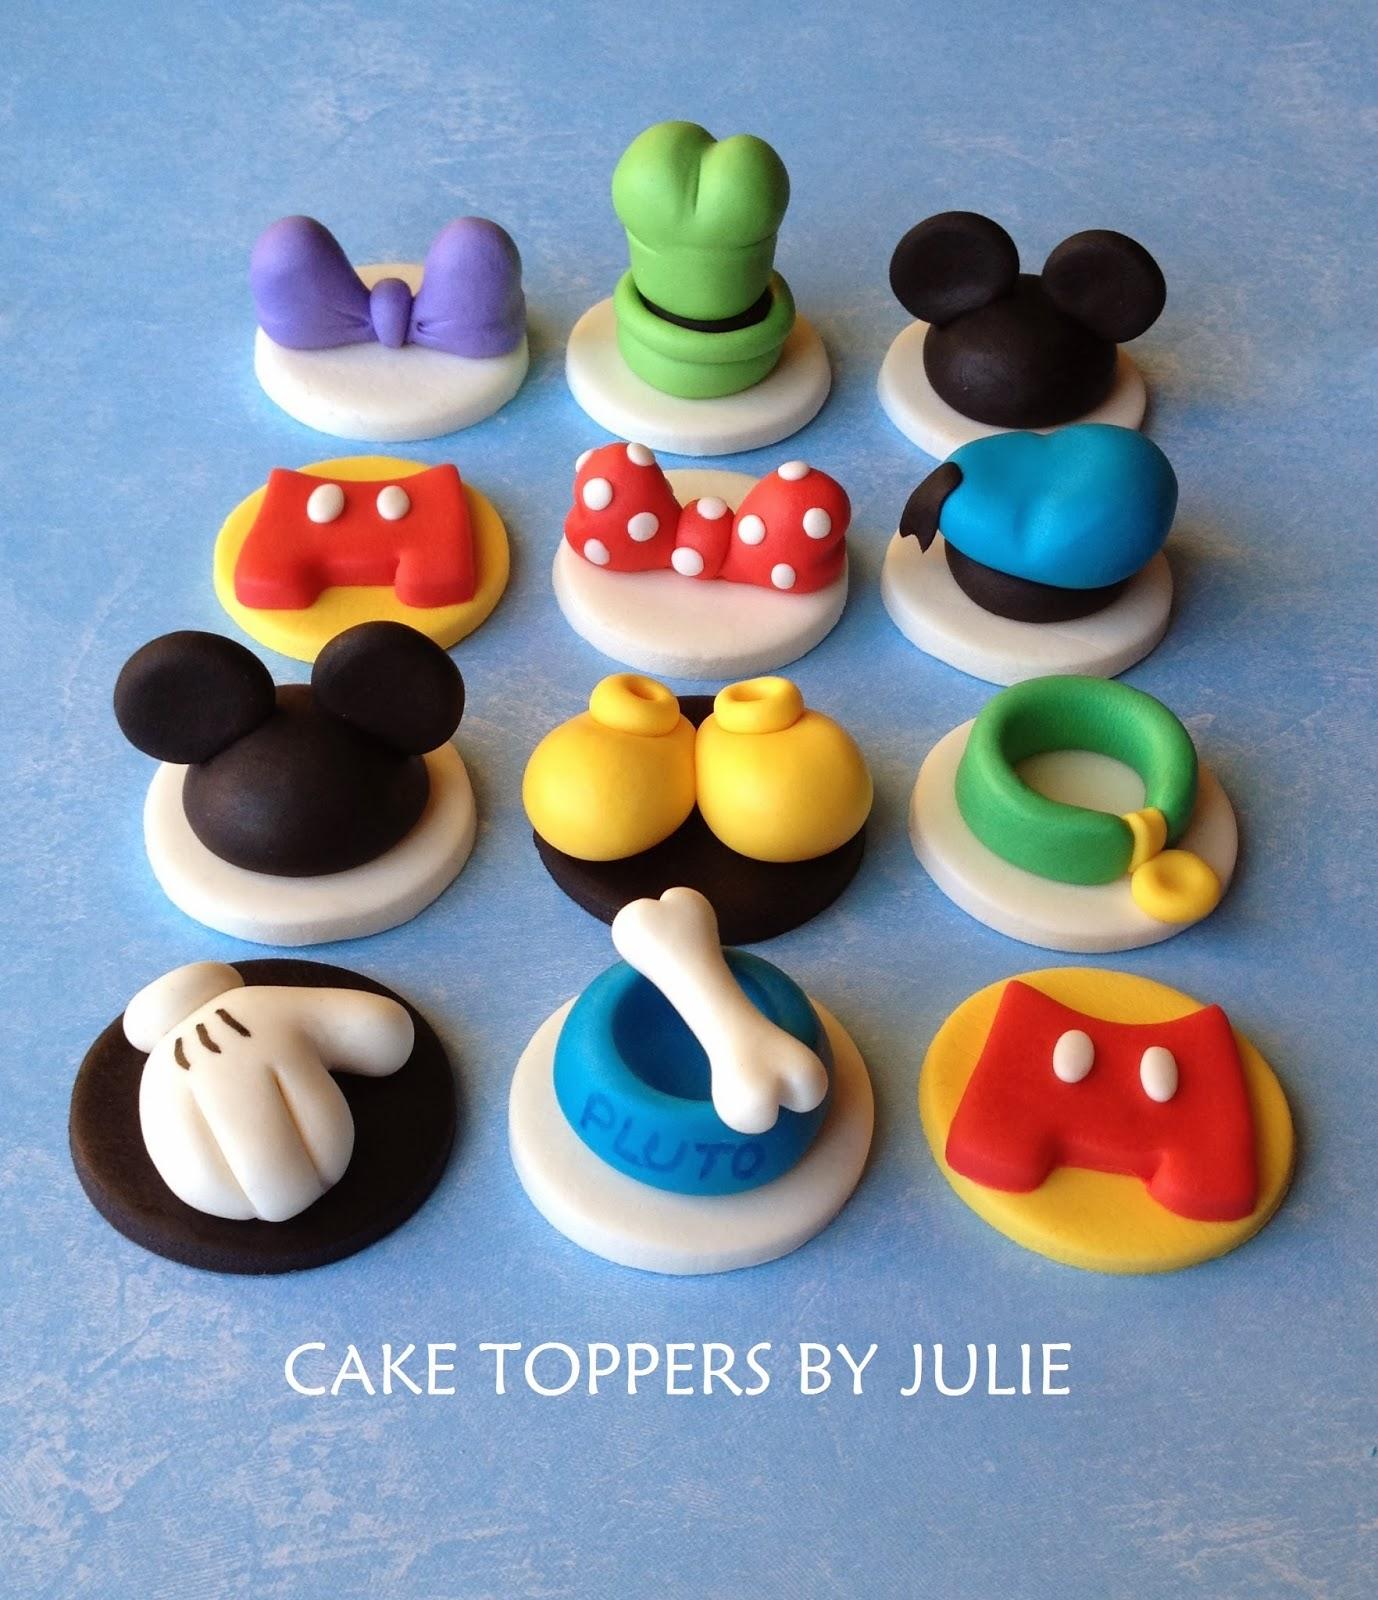 Custom Cakes By Julie February 2014